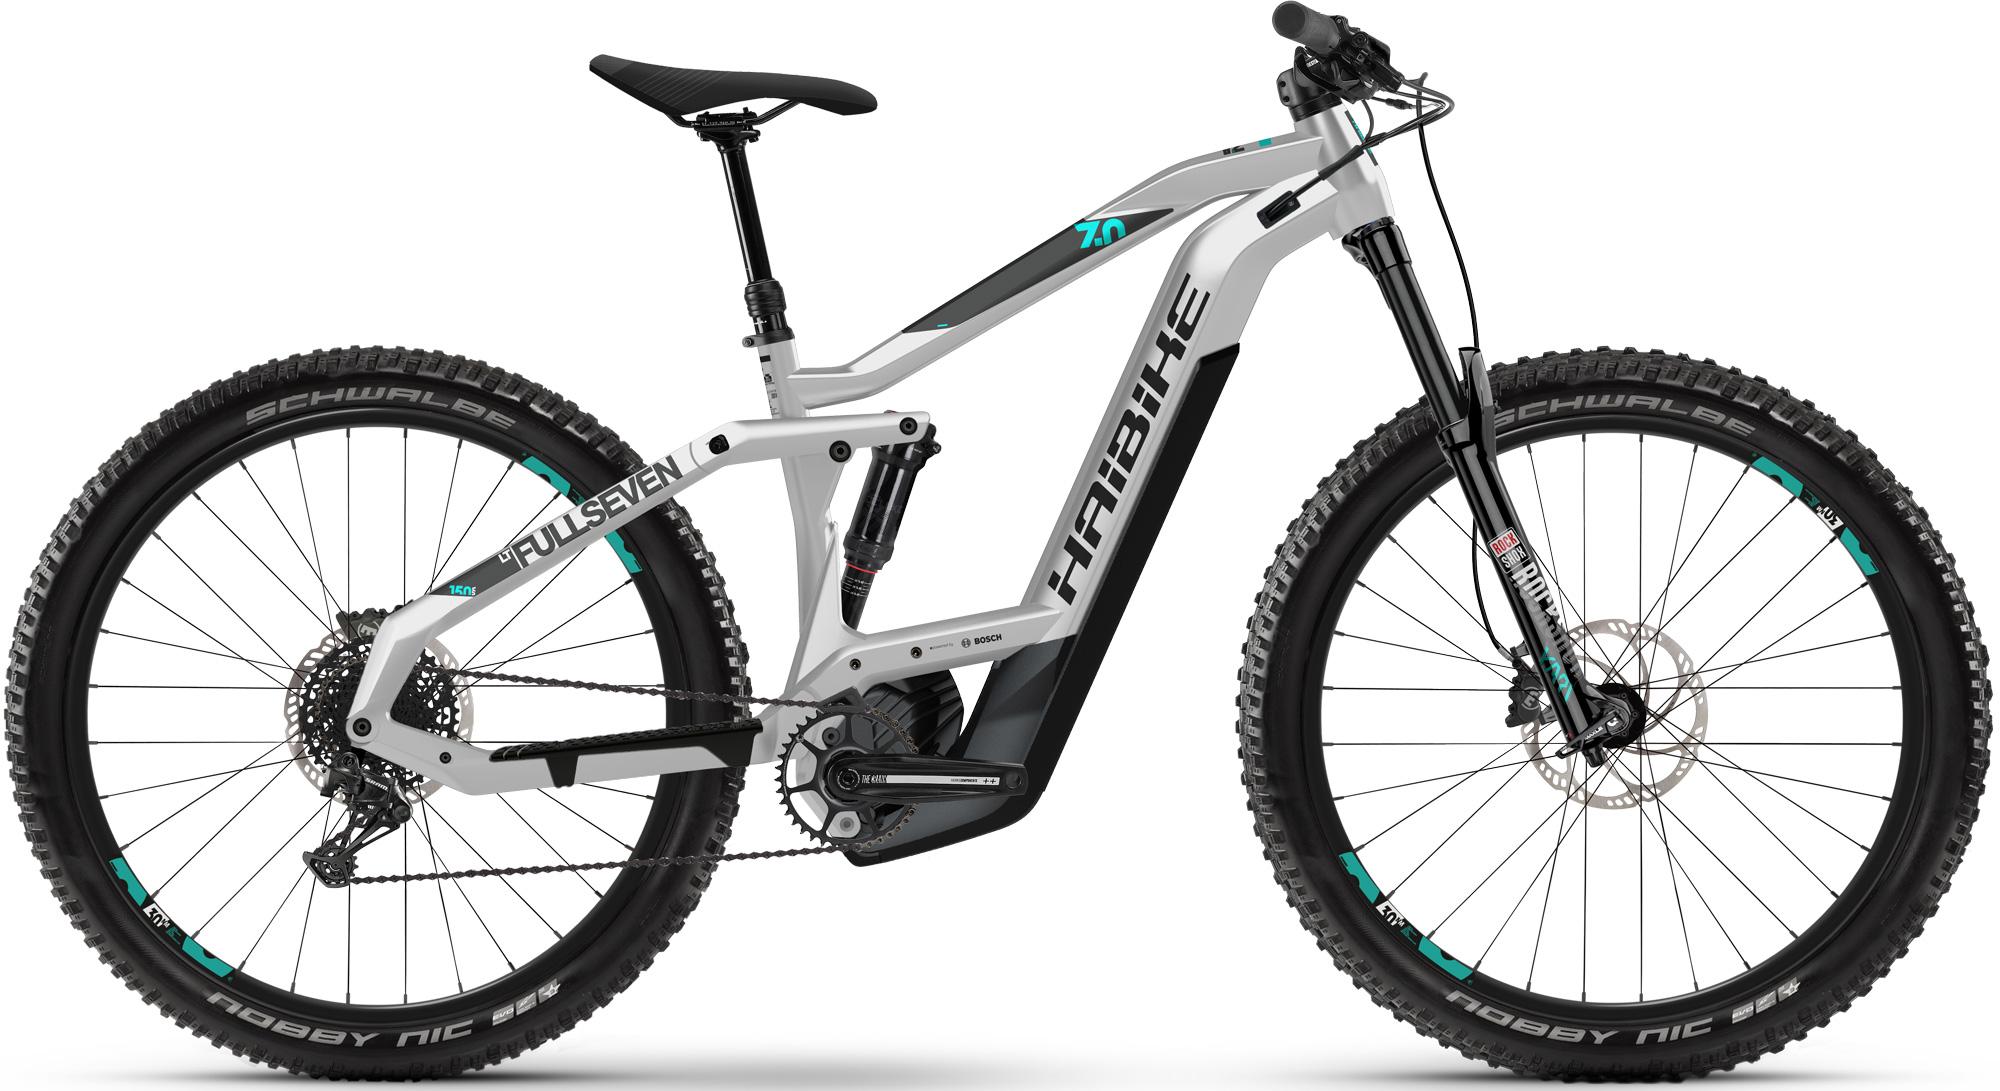 Bicycle Handlebar Streamers Neon Multi-color Bikes New 1362!